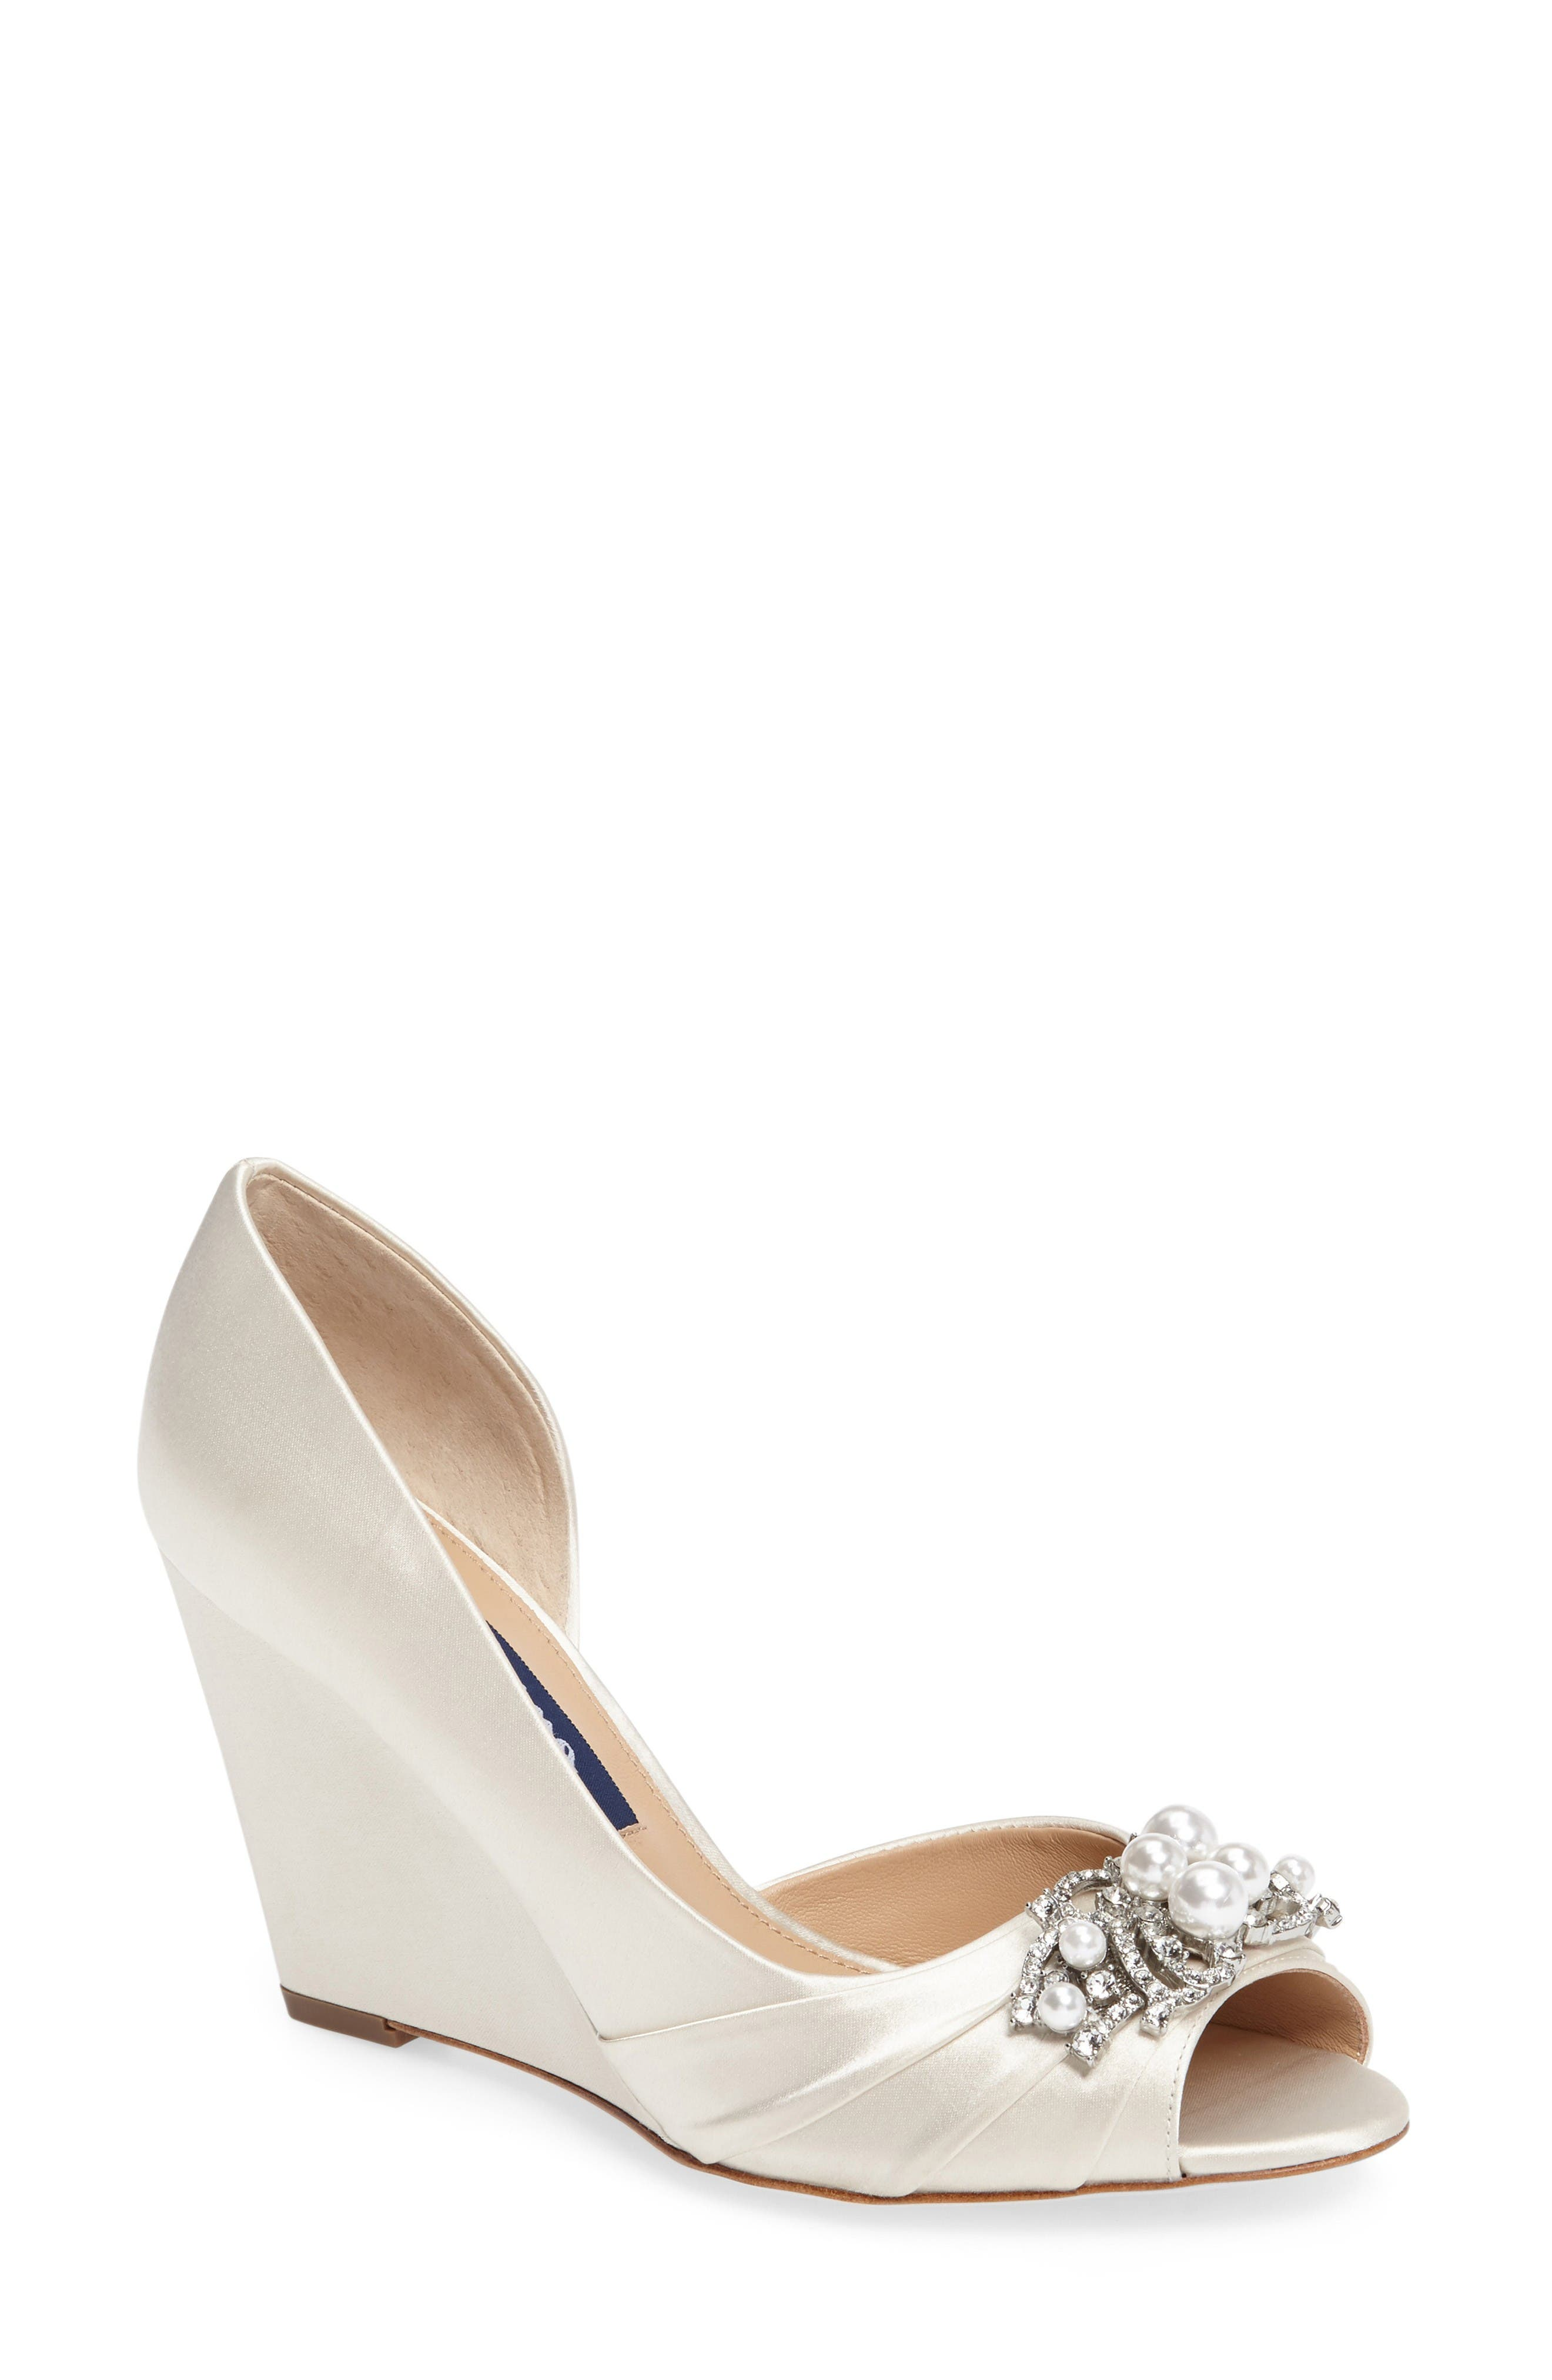 Nina Rona Swarovski Wedge Sandal (Women)